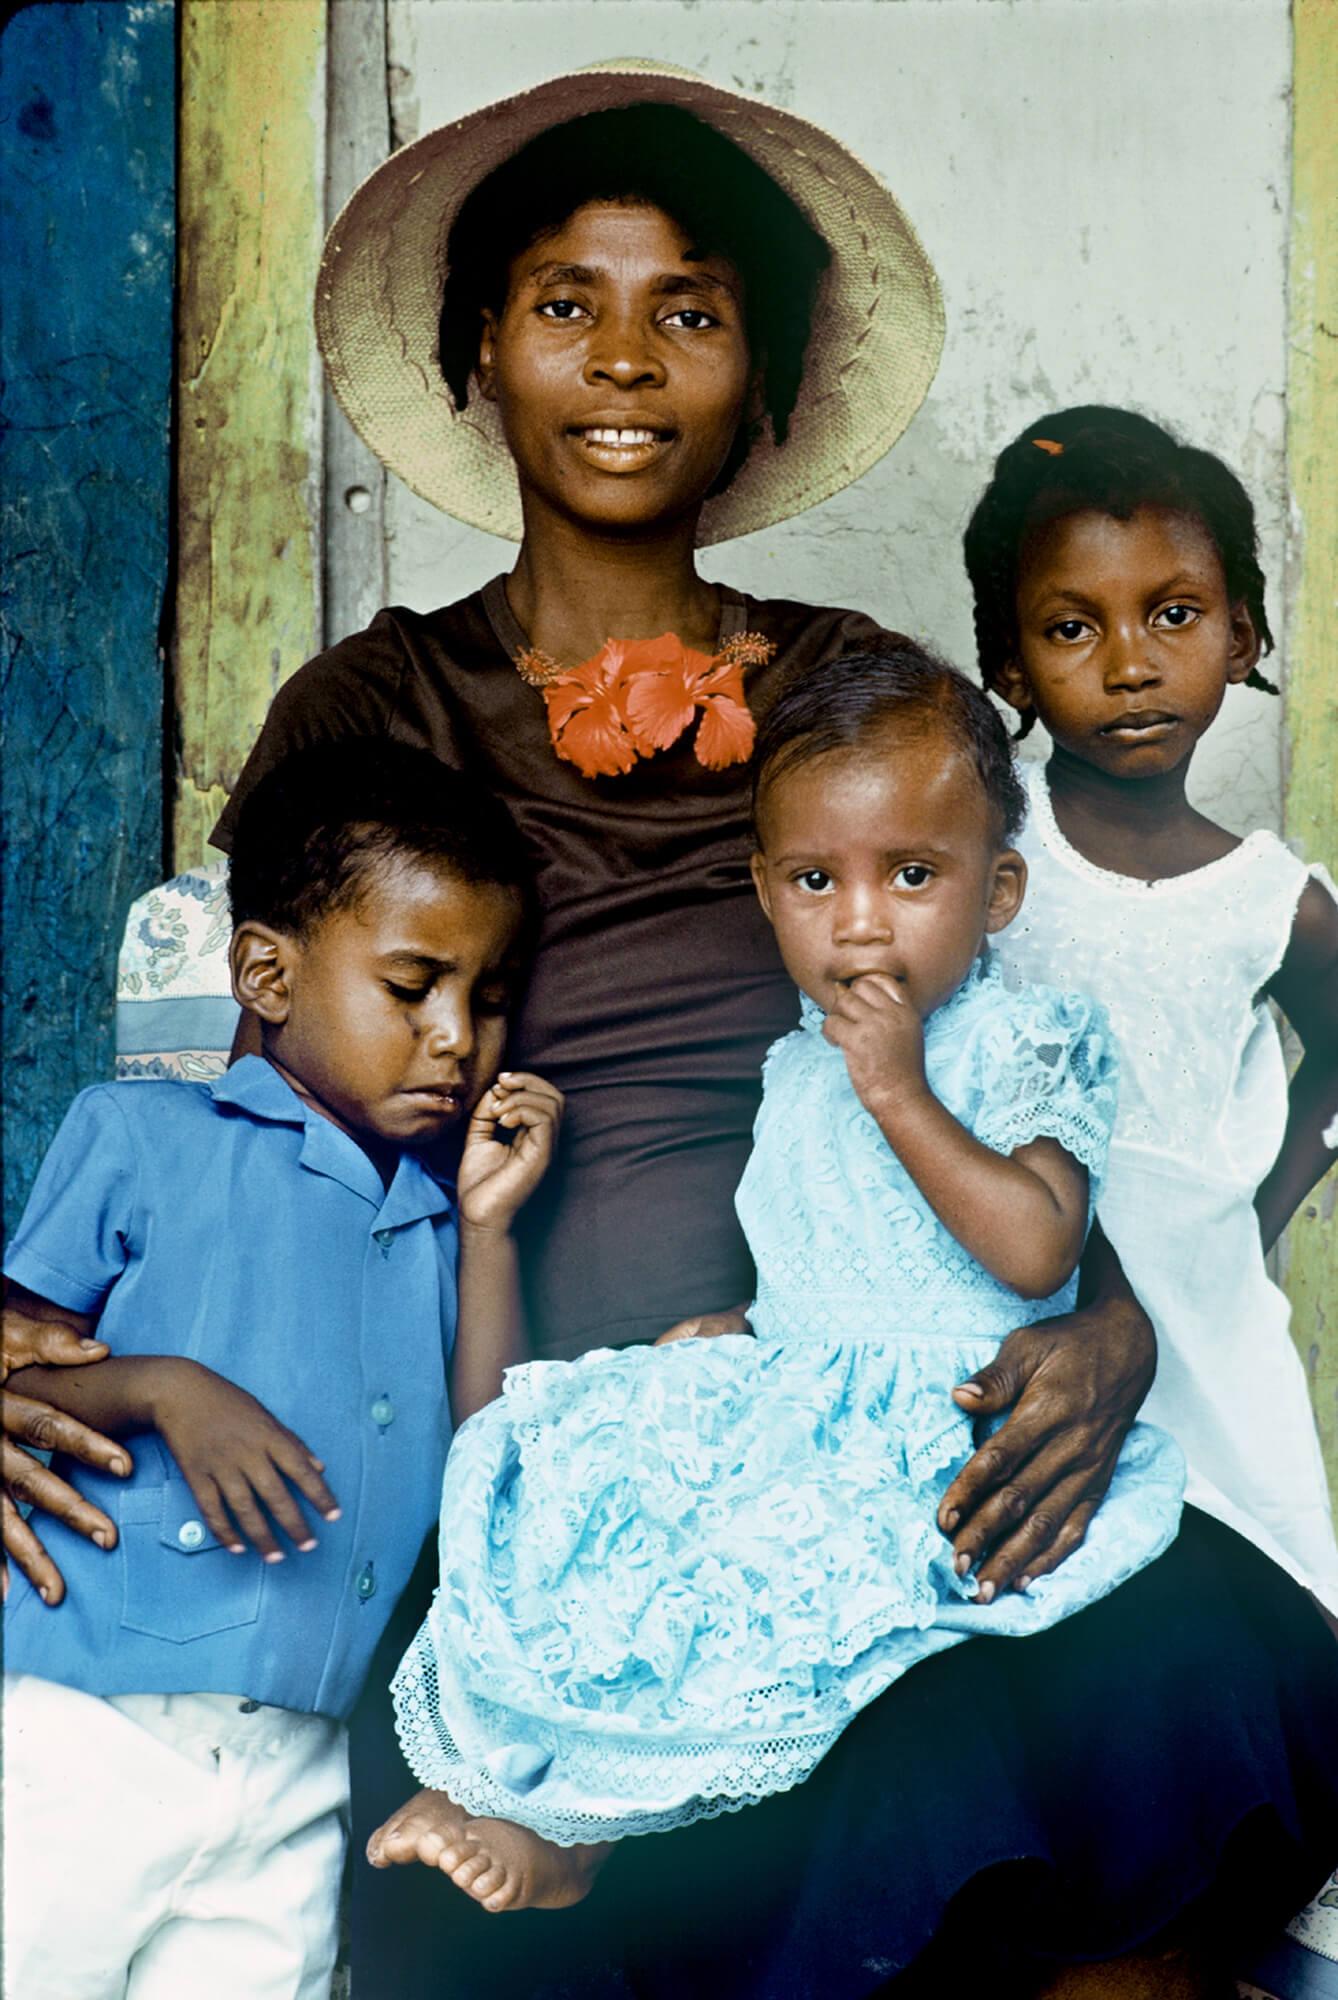 Steber_-Haiti-Duverger-Family